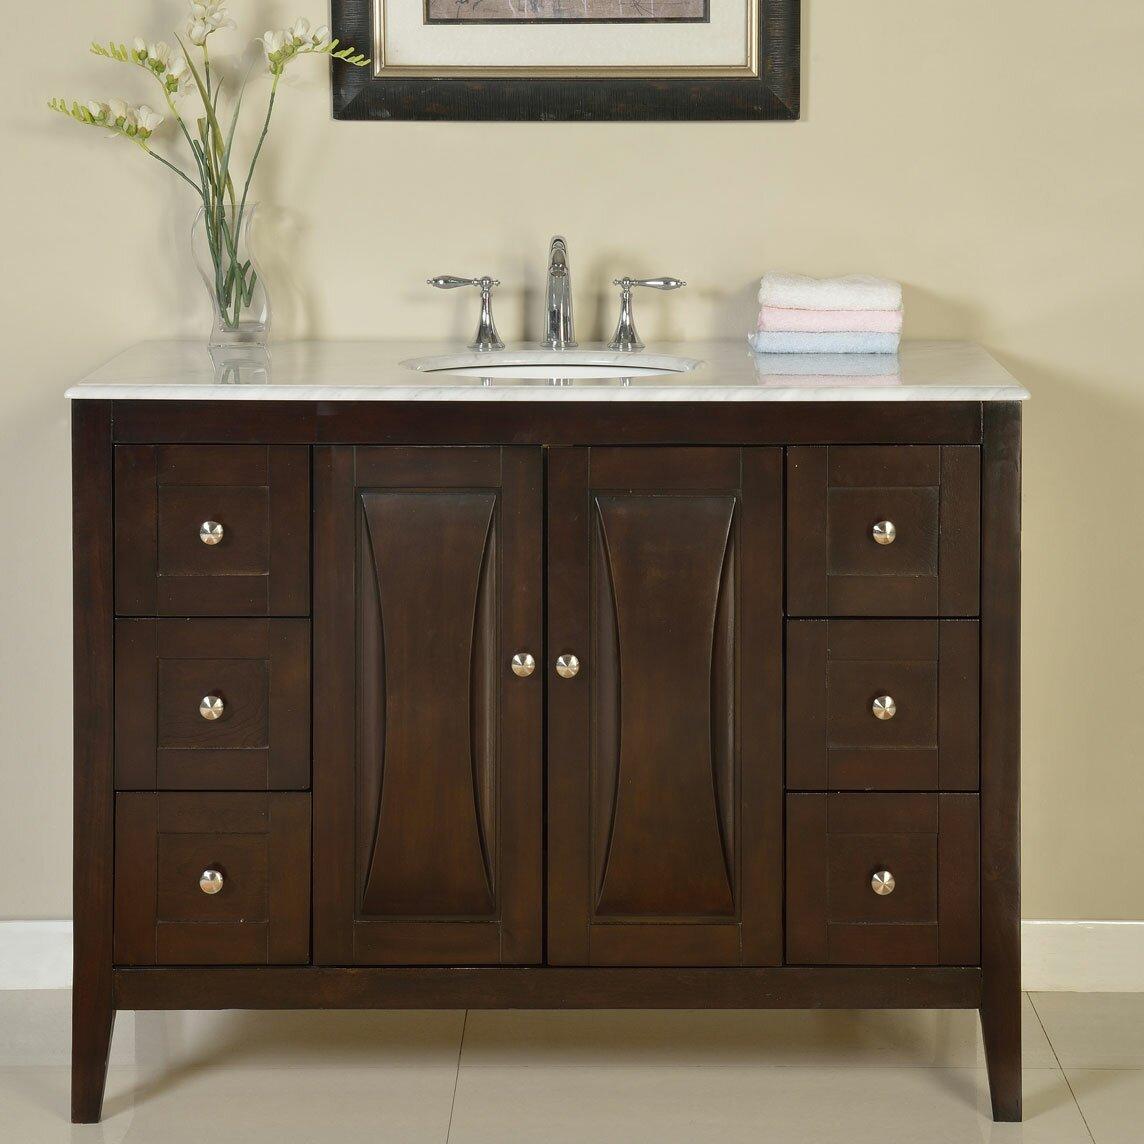 silkroad exclusive 48 single sink cabinet bathroom vanity set reviews wayfair. Black Bedroom Furniture Sets. Home Design Ideas